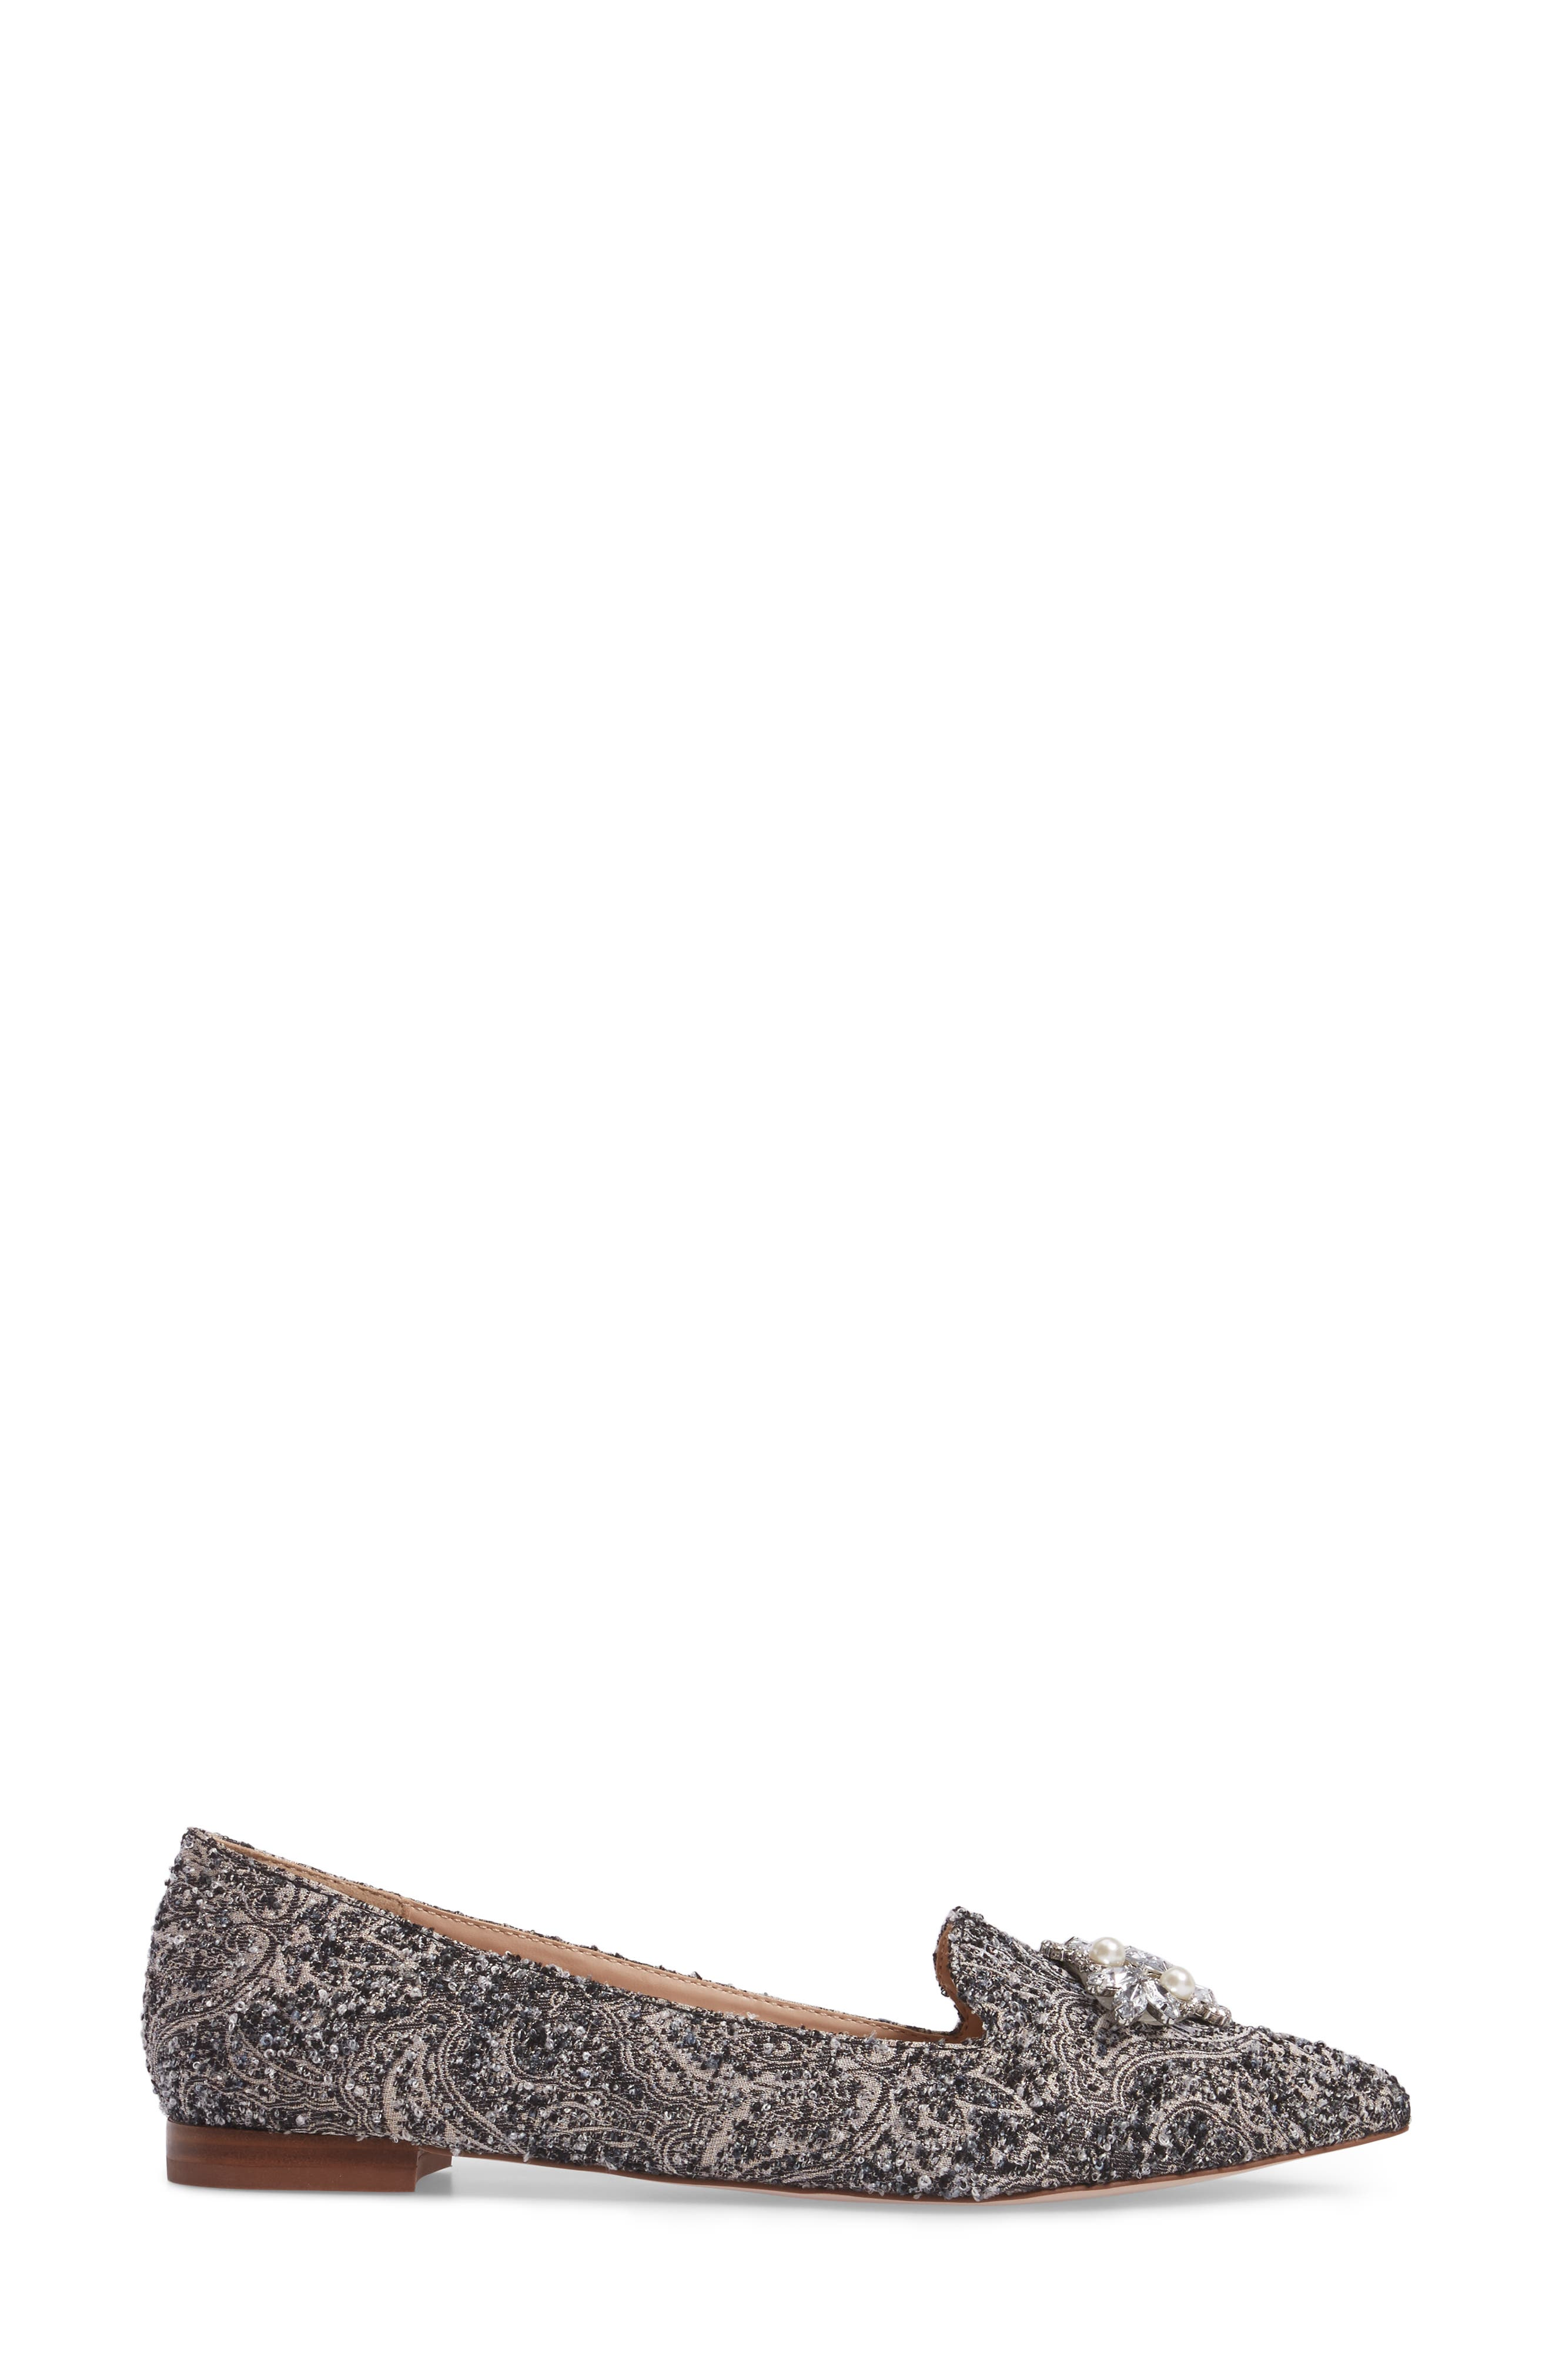 Alternate Image 3  - Sole Society Libry Crystal Embellished Flat (Women)